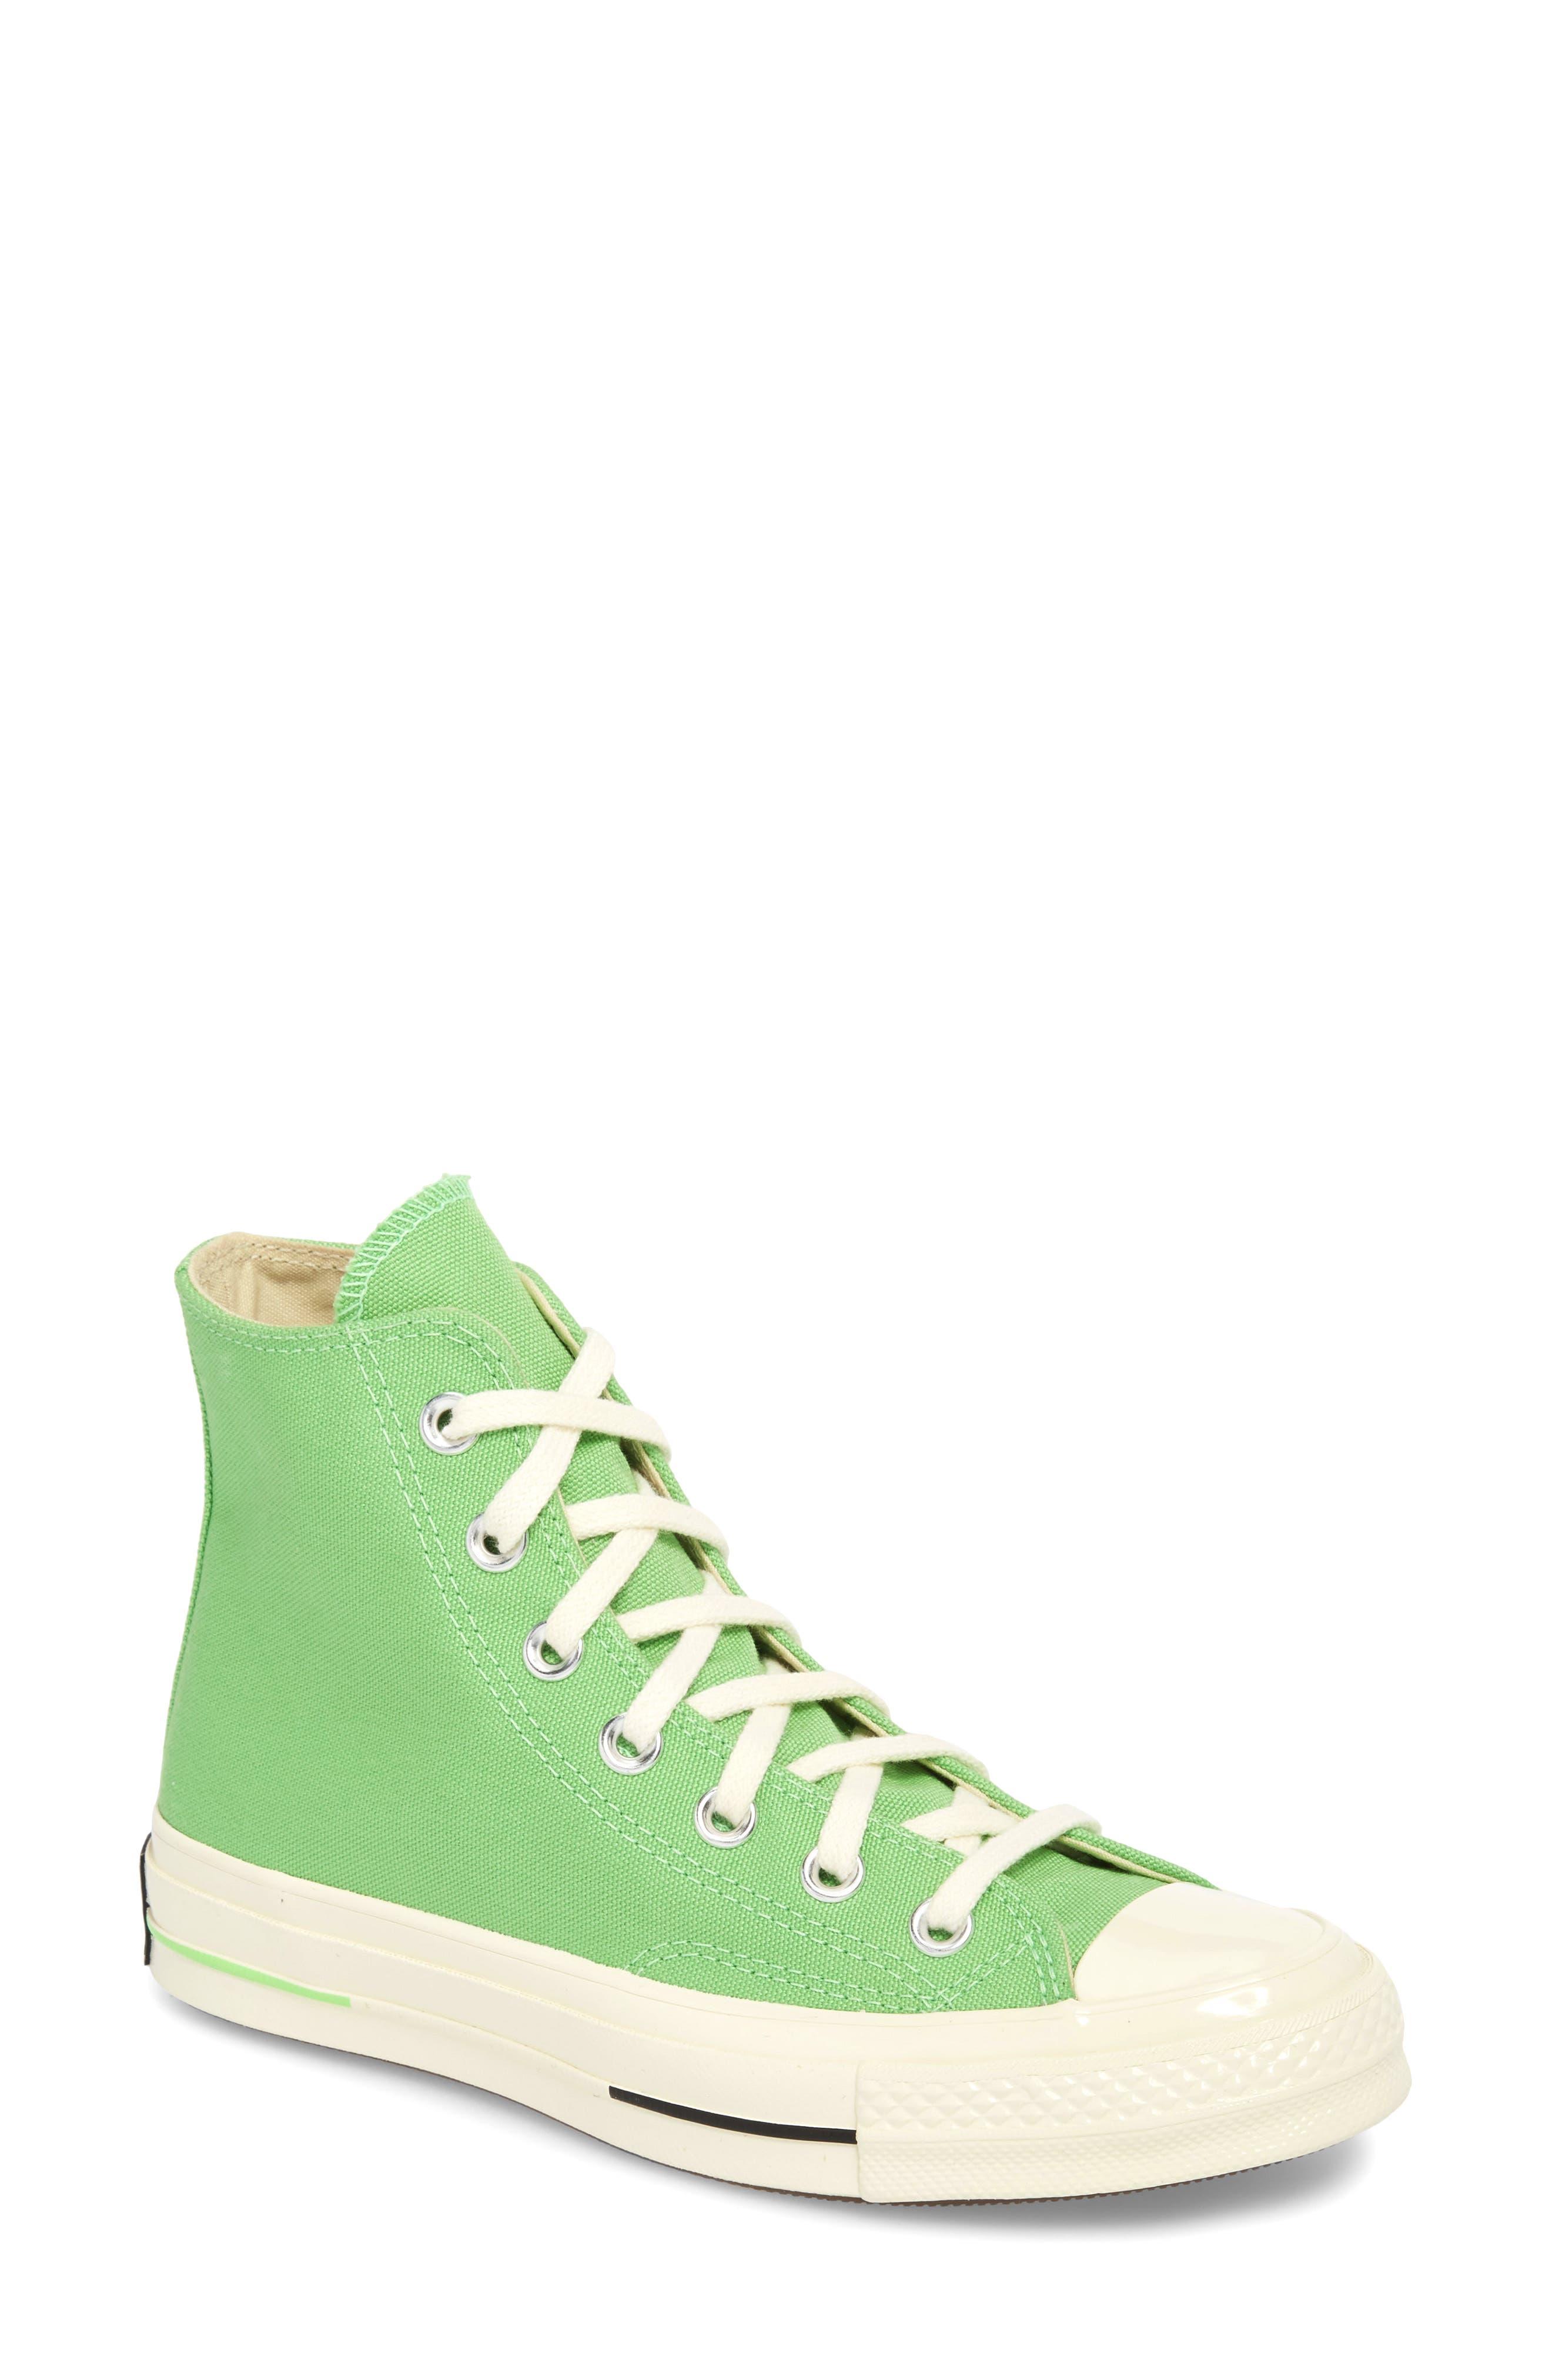 Chuck Taylor<sup>®</sup> All Star<sup>®</sup> 70 Brights High Top Sneaker,                             Main thumbnail 1, color,                             Illusion Green